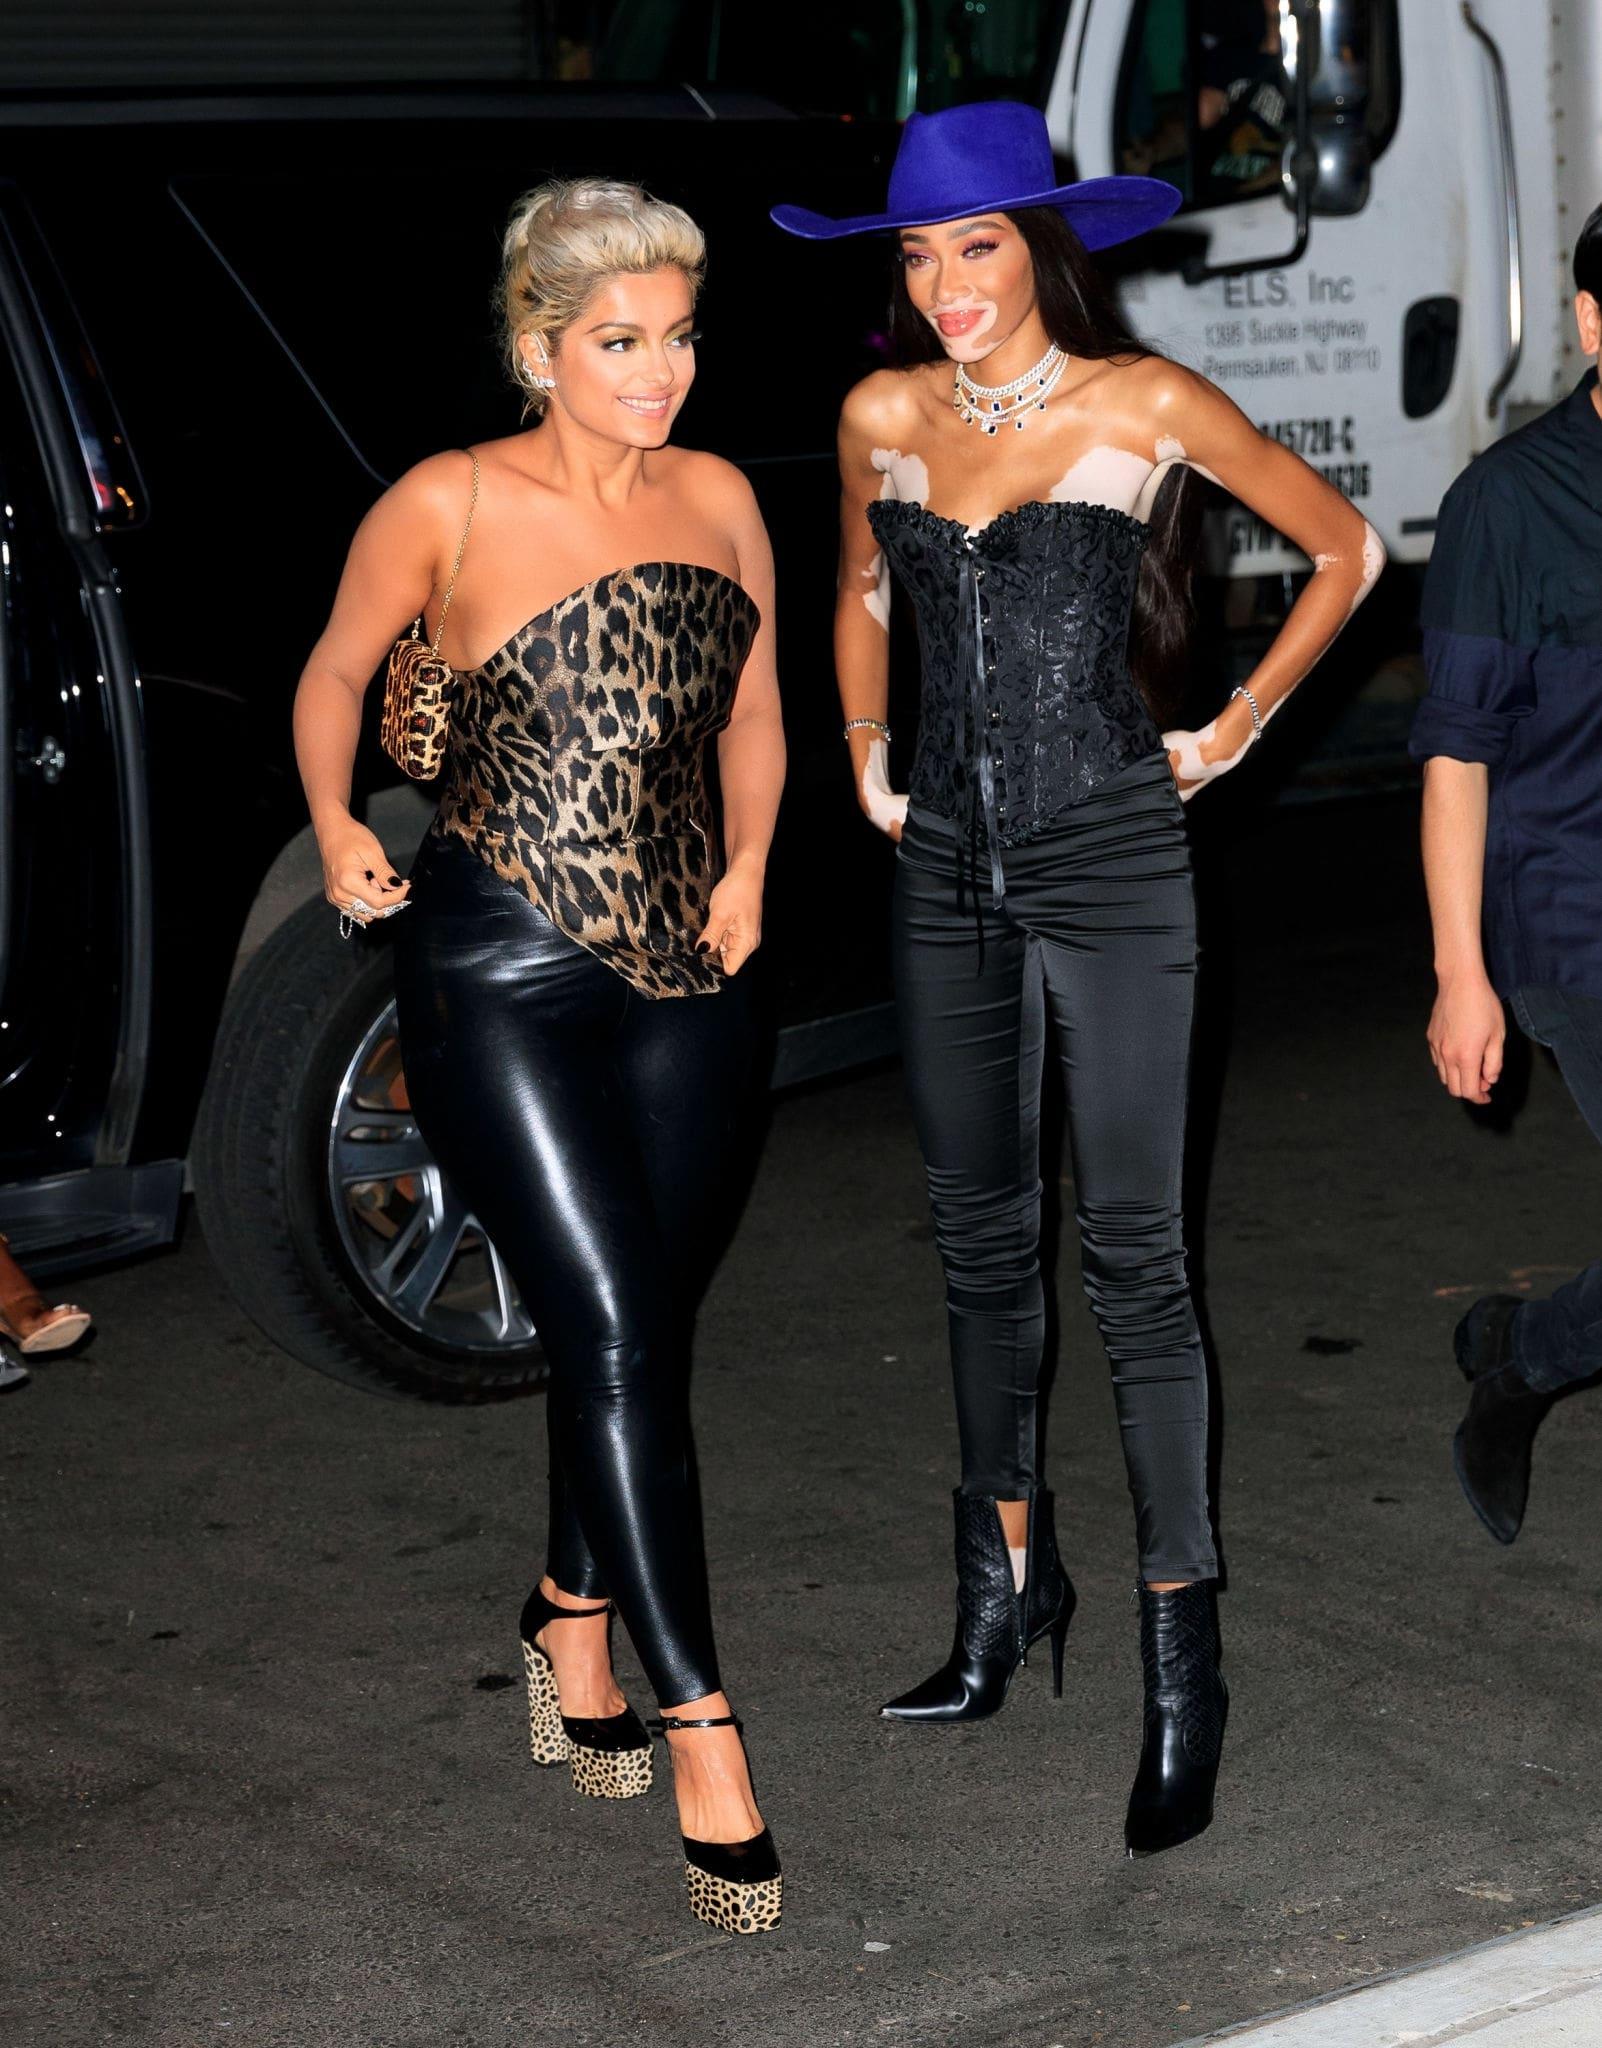 Bebe Rexha attends Republic Records VMA After Party